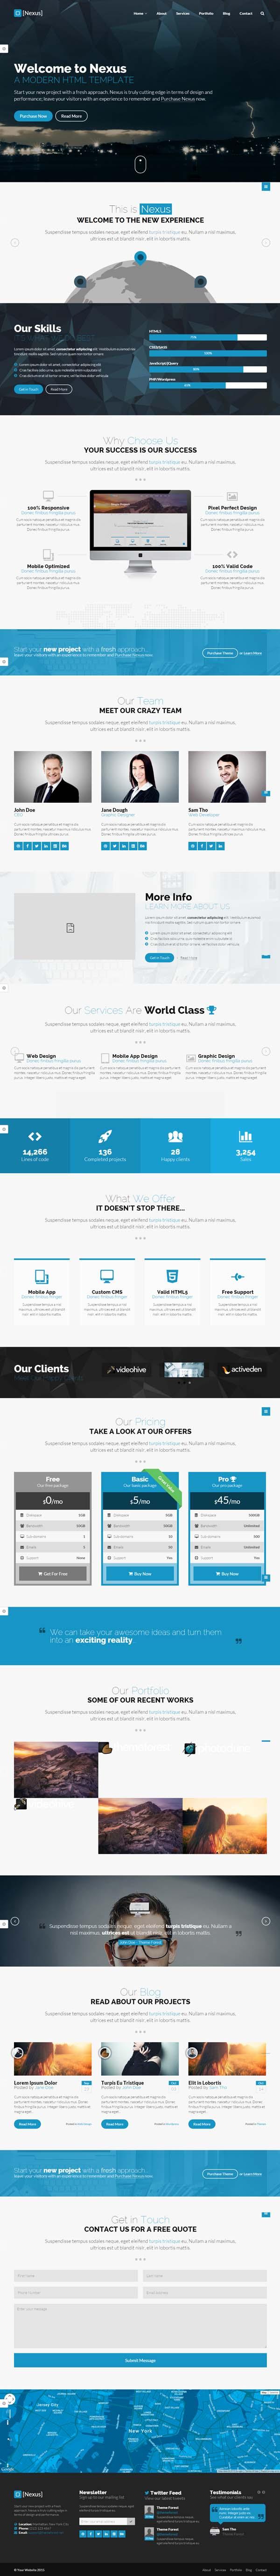 Nexus - Responsive Multipurpose HTML5 Template